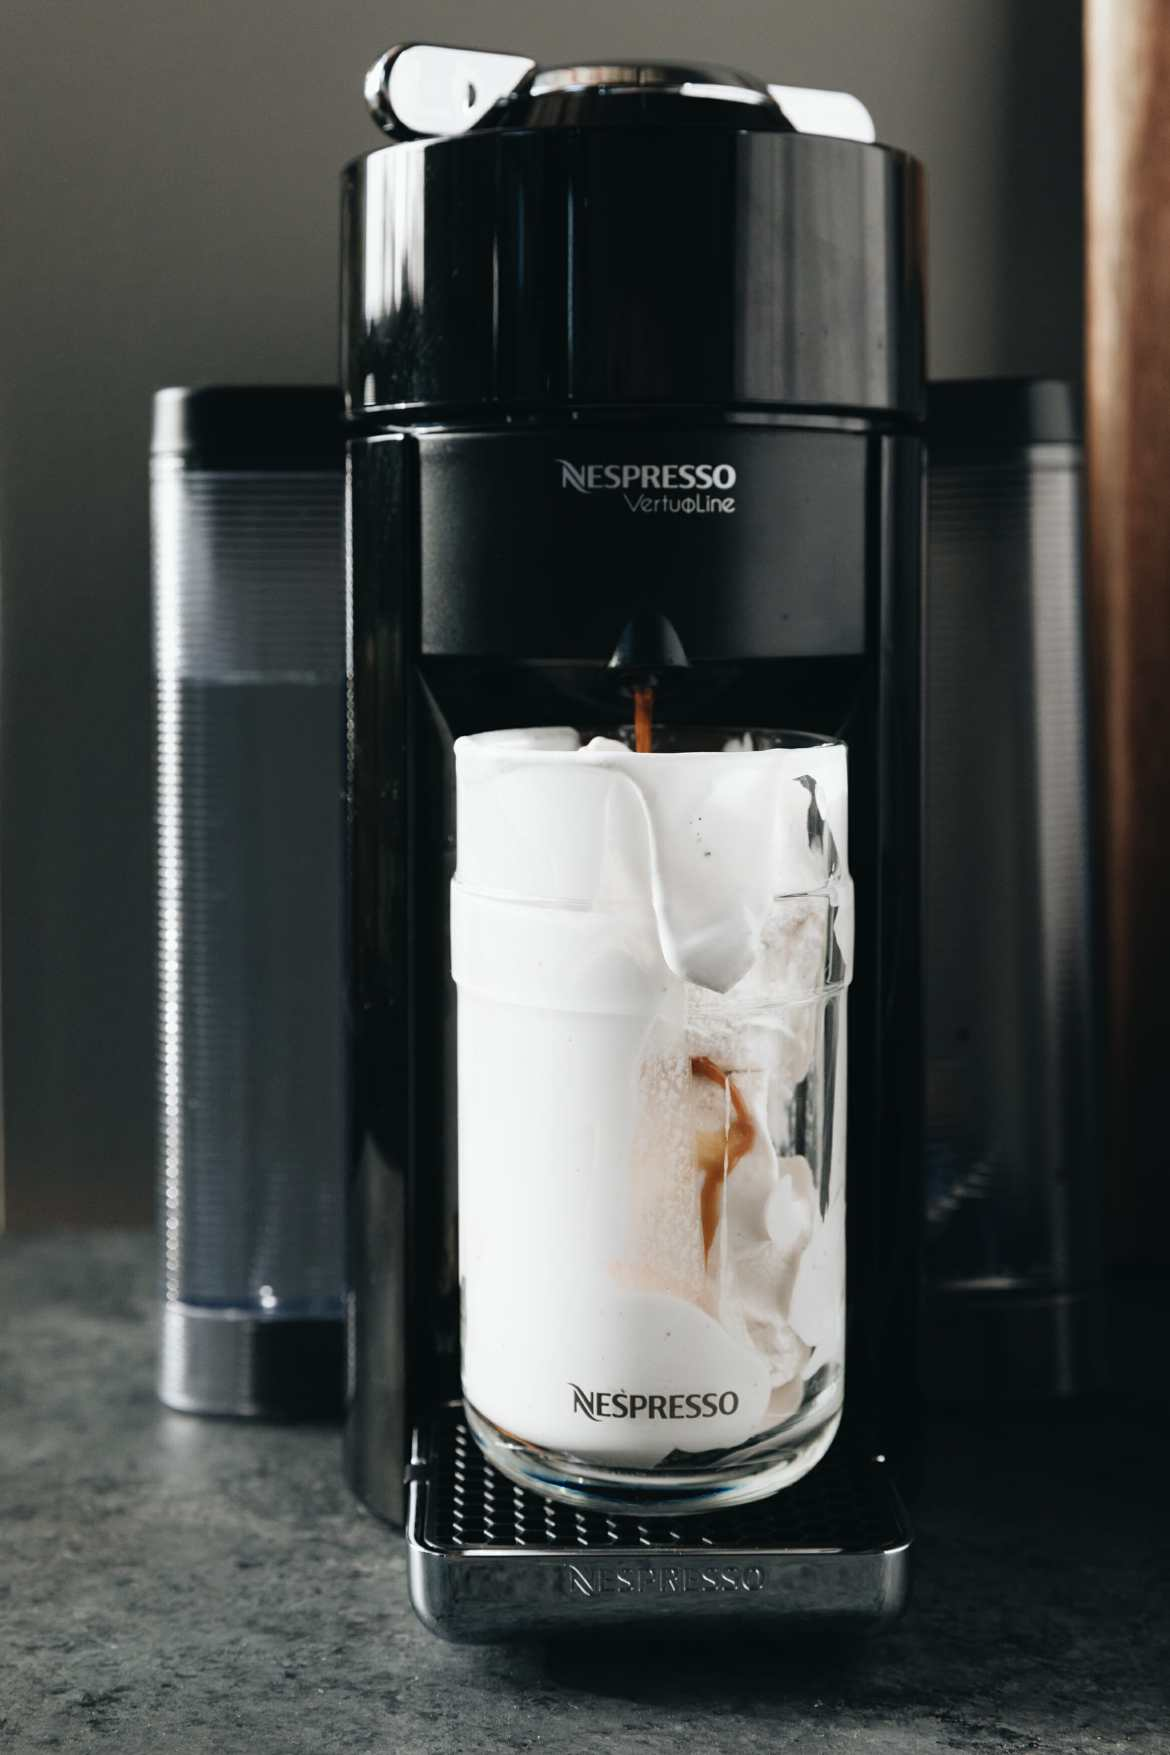 nespresso machine brewing coffee with ice cream